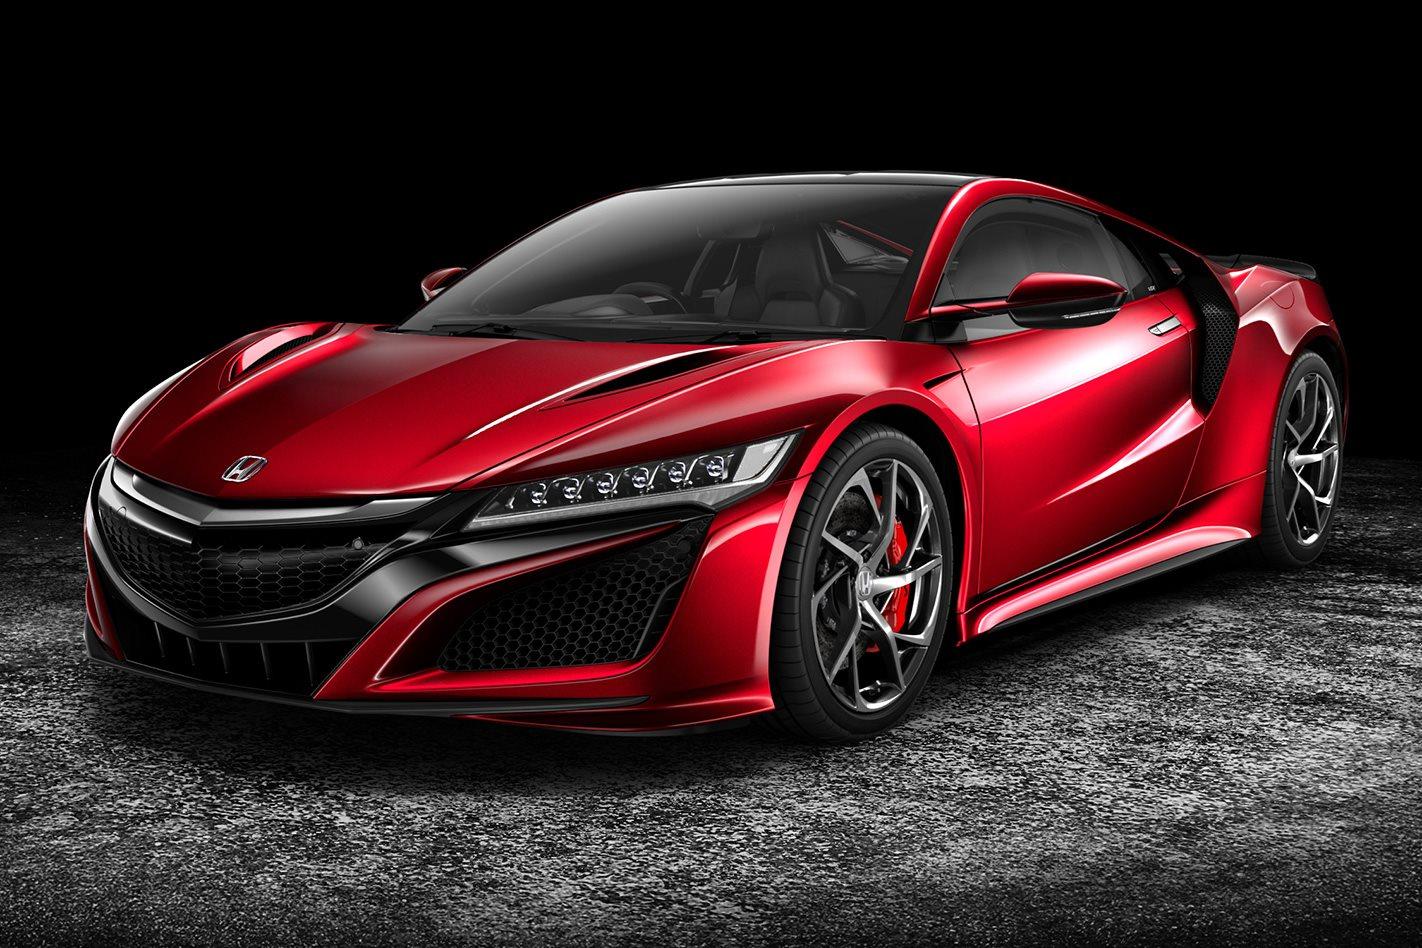 2016 Honda NSX hybrid supercar to wear $420,000 price tag ...